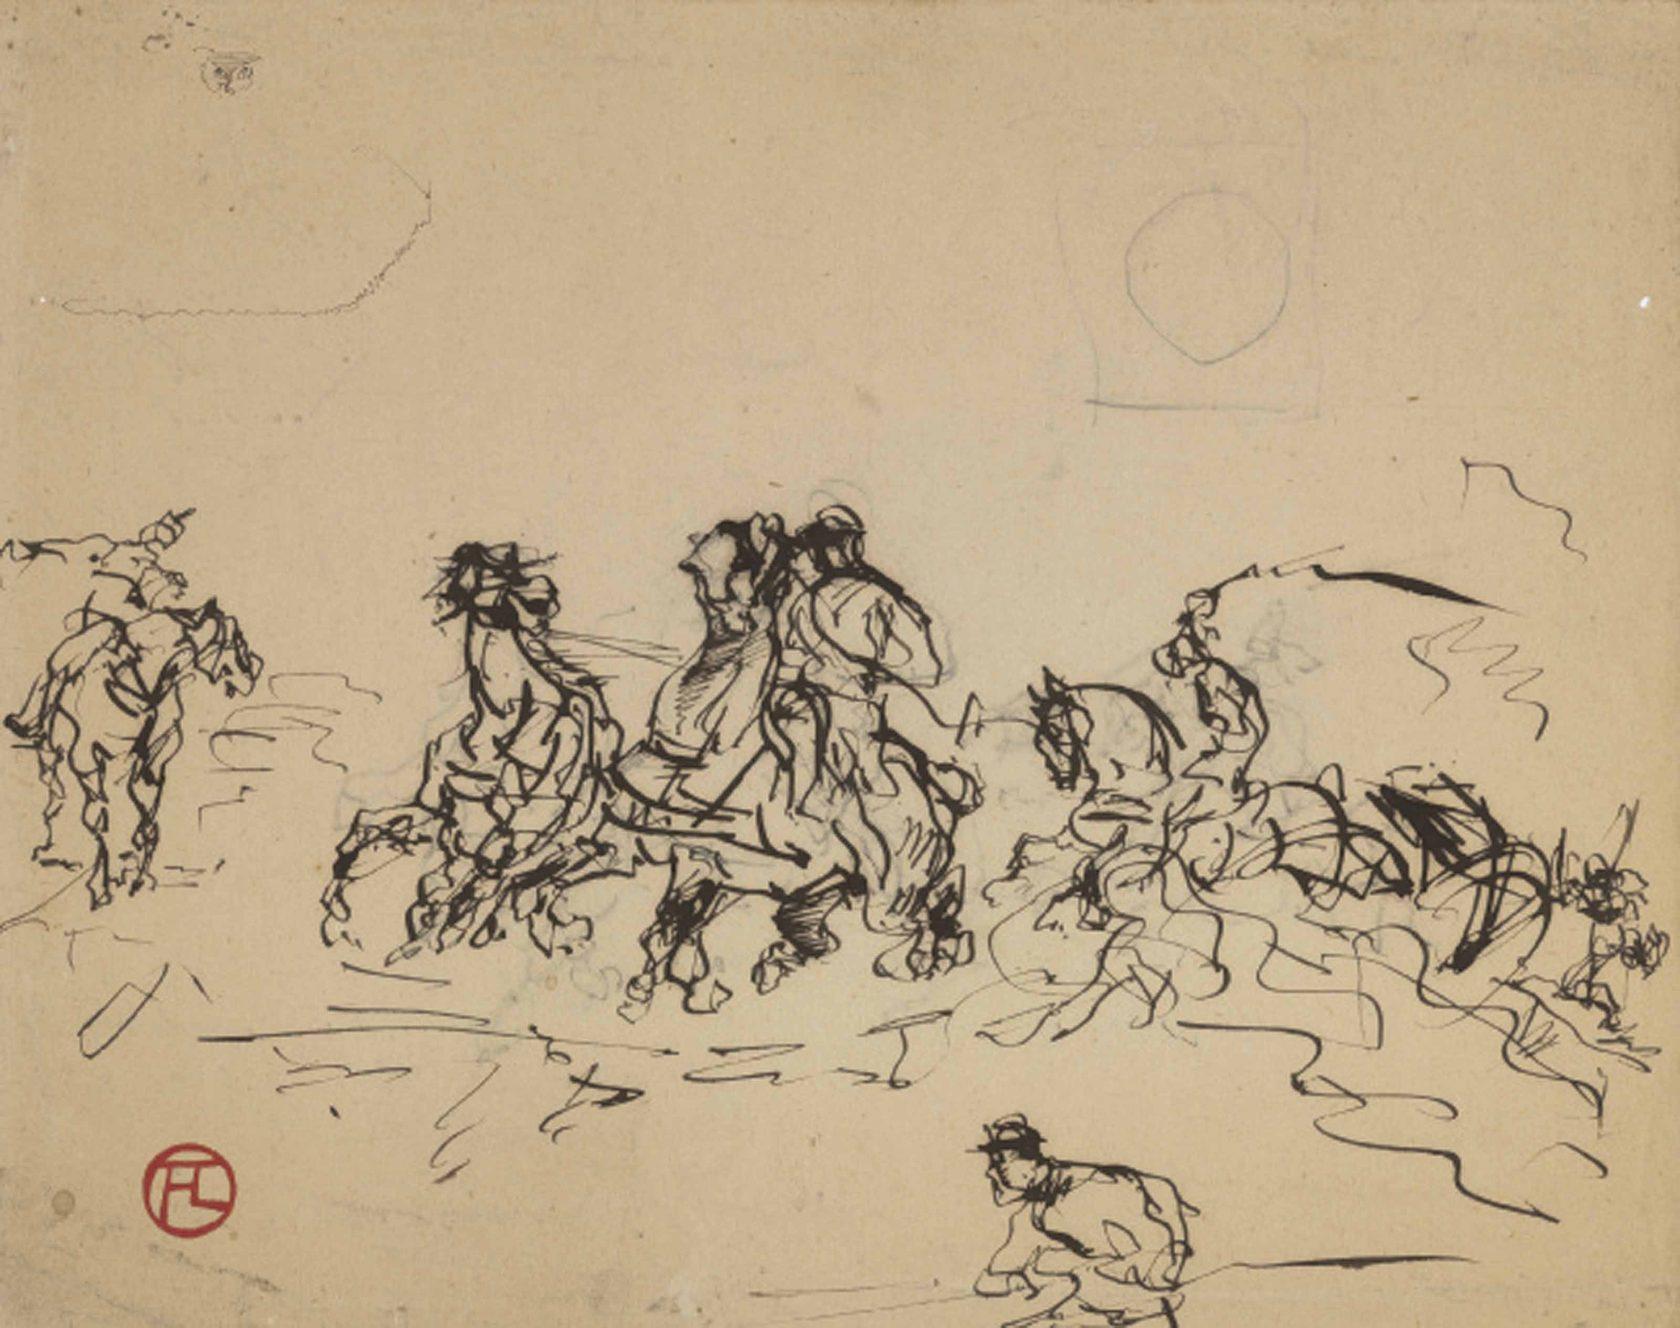 Скейтчи Анри Тулуз-Лотрека, 12 — 16 лет, 1876 — 1880 год